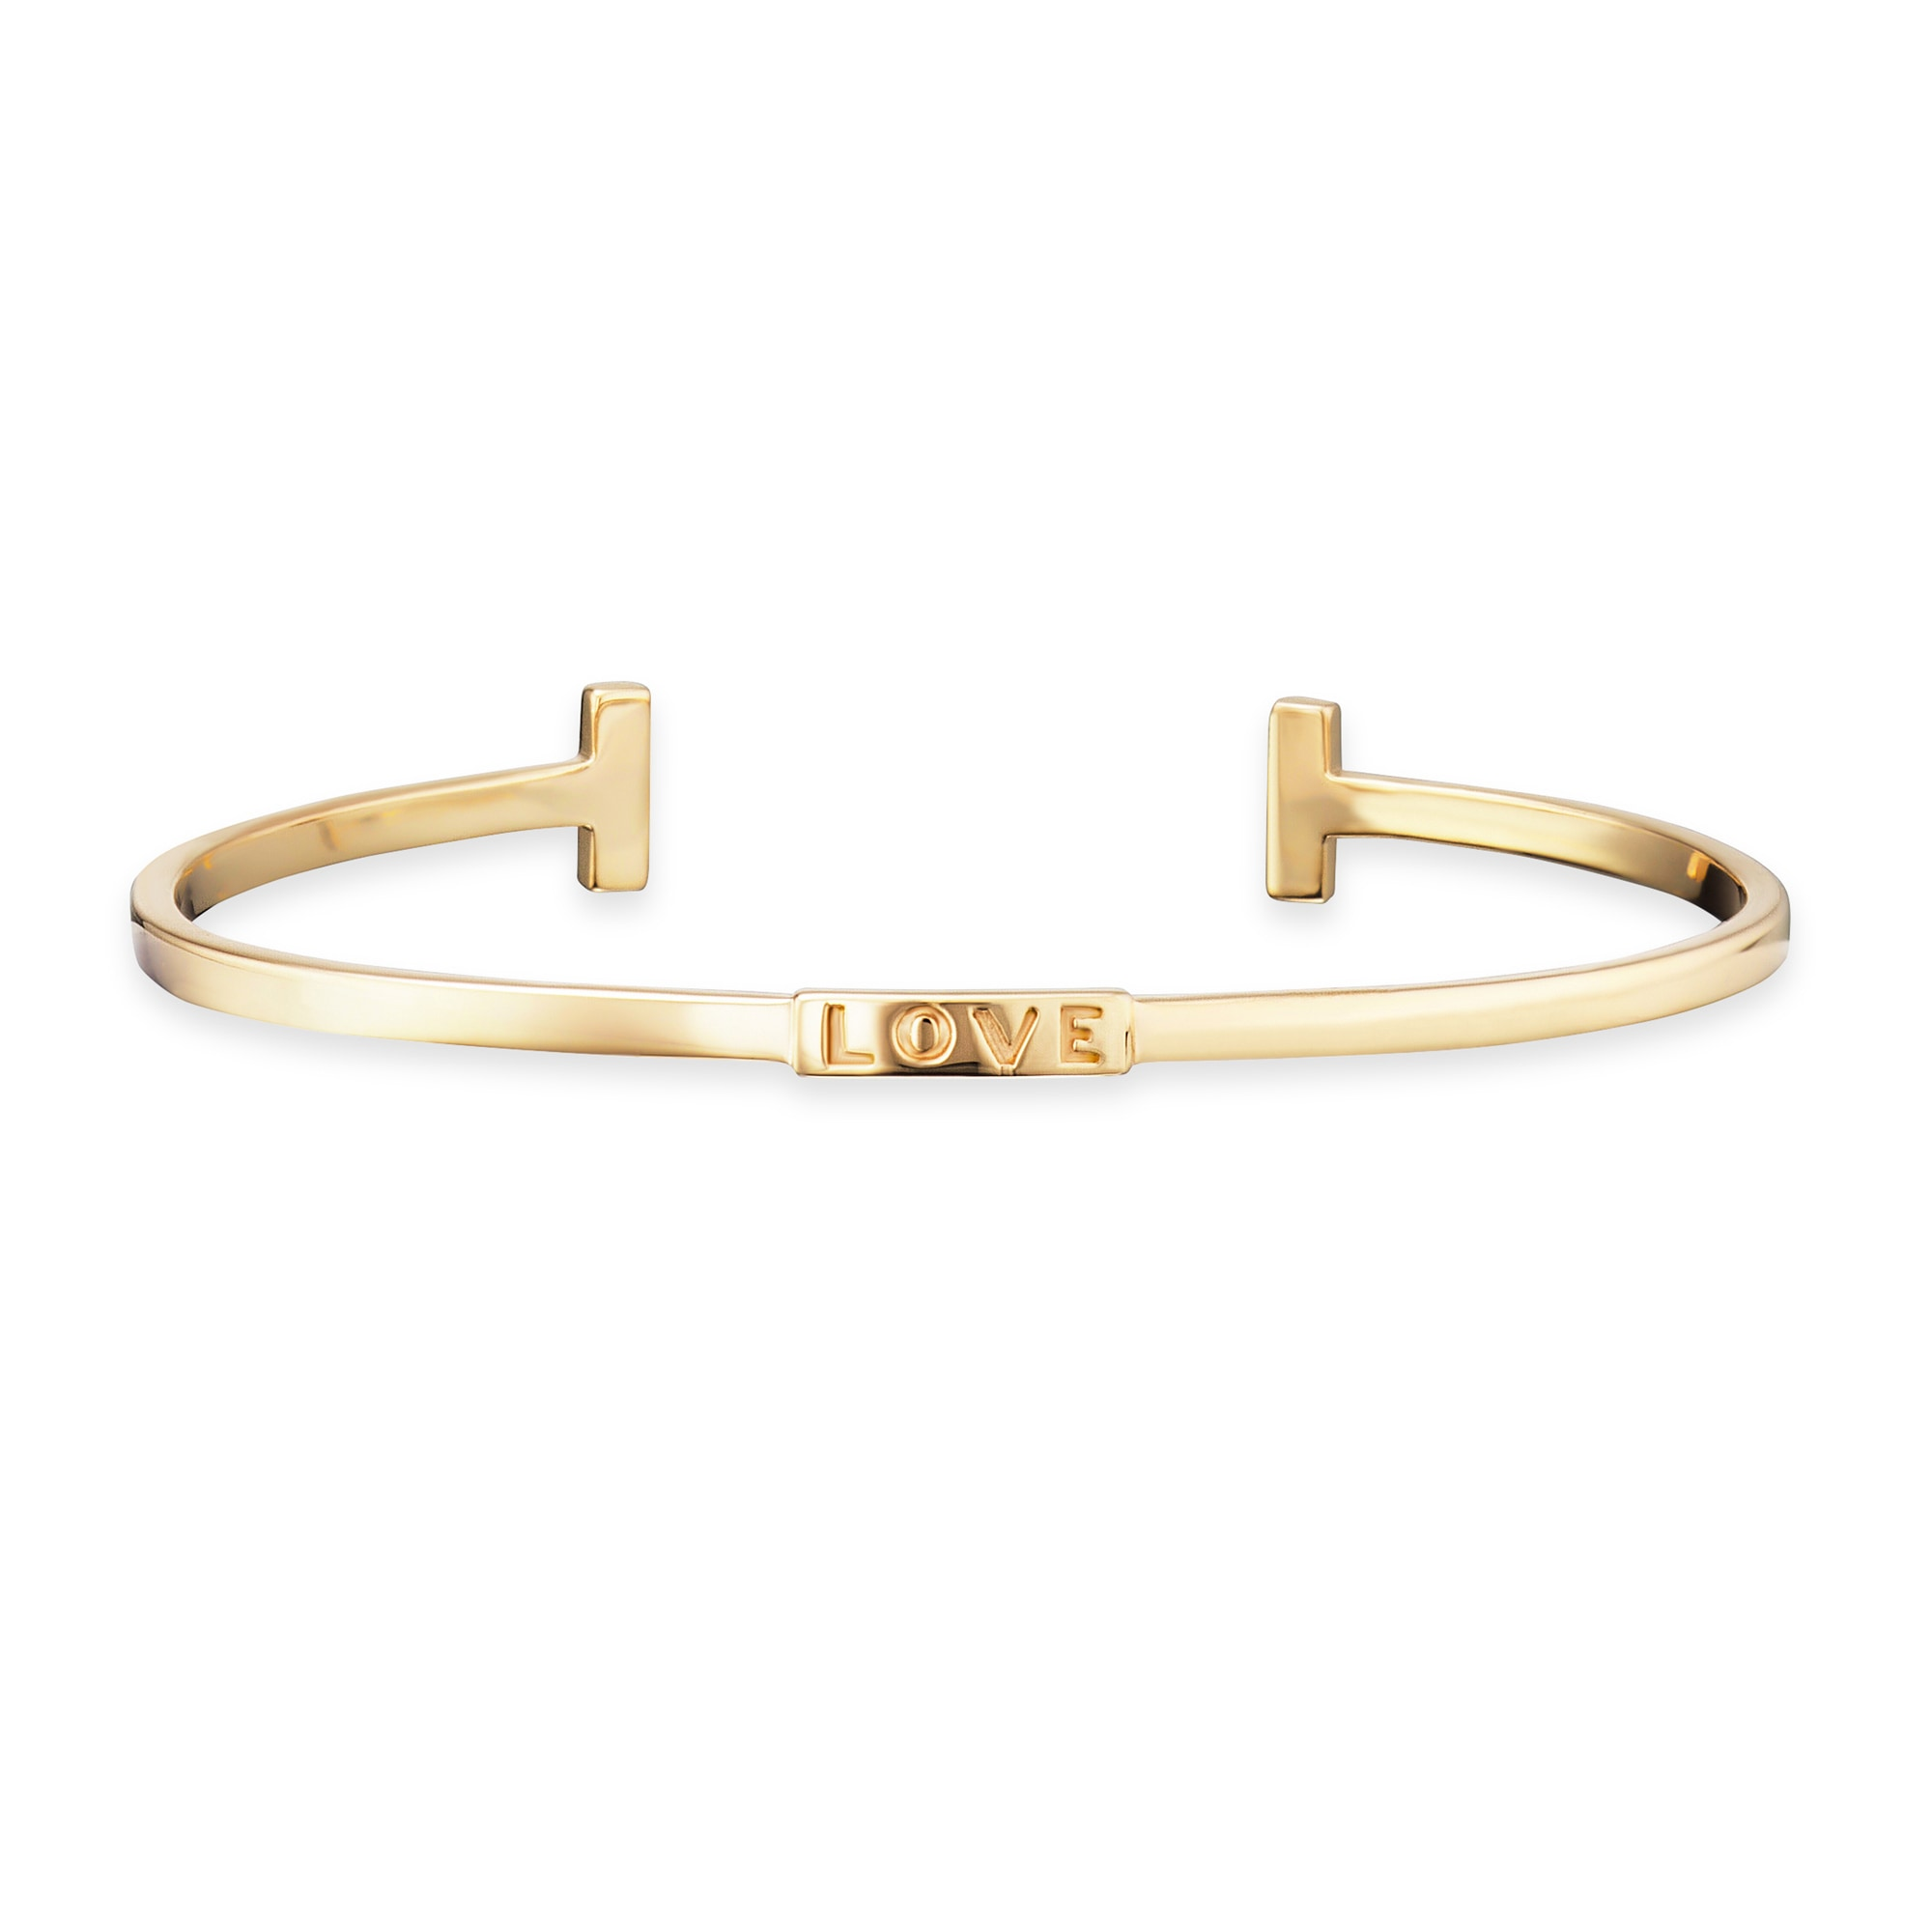 Cai Armreif 925/- Sterling Silber vergoldet LOVE   Schmuck > Armbänder > Armreifen   Gelb   Cai